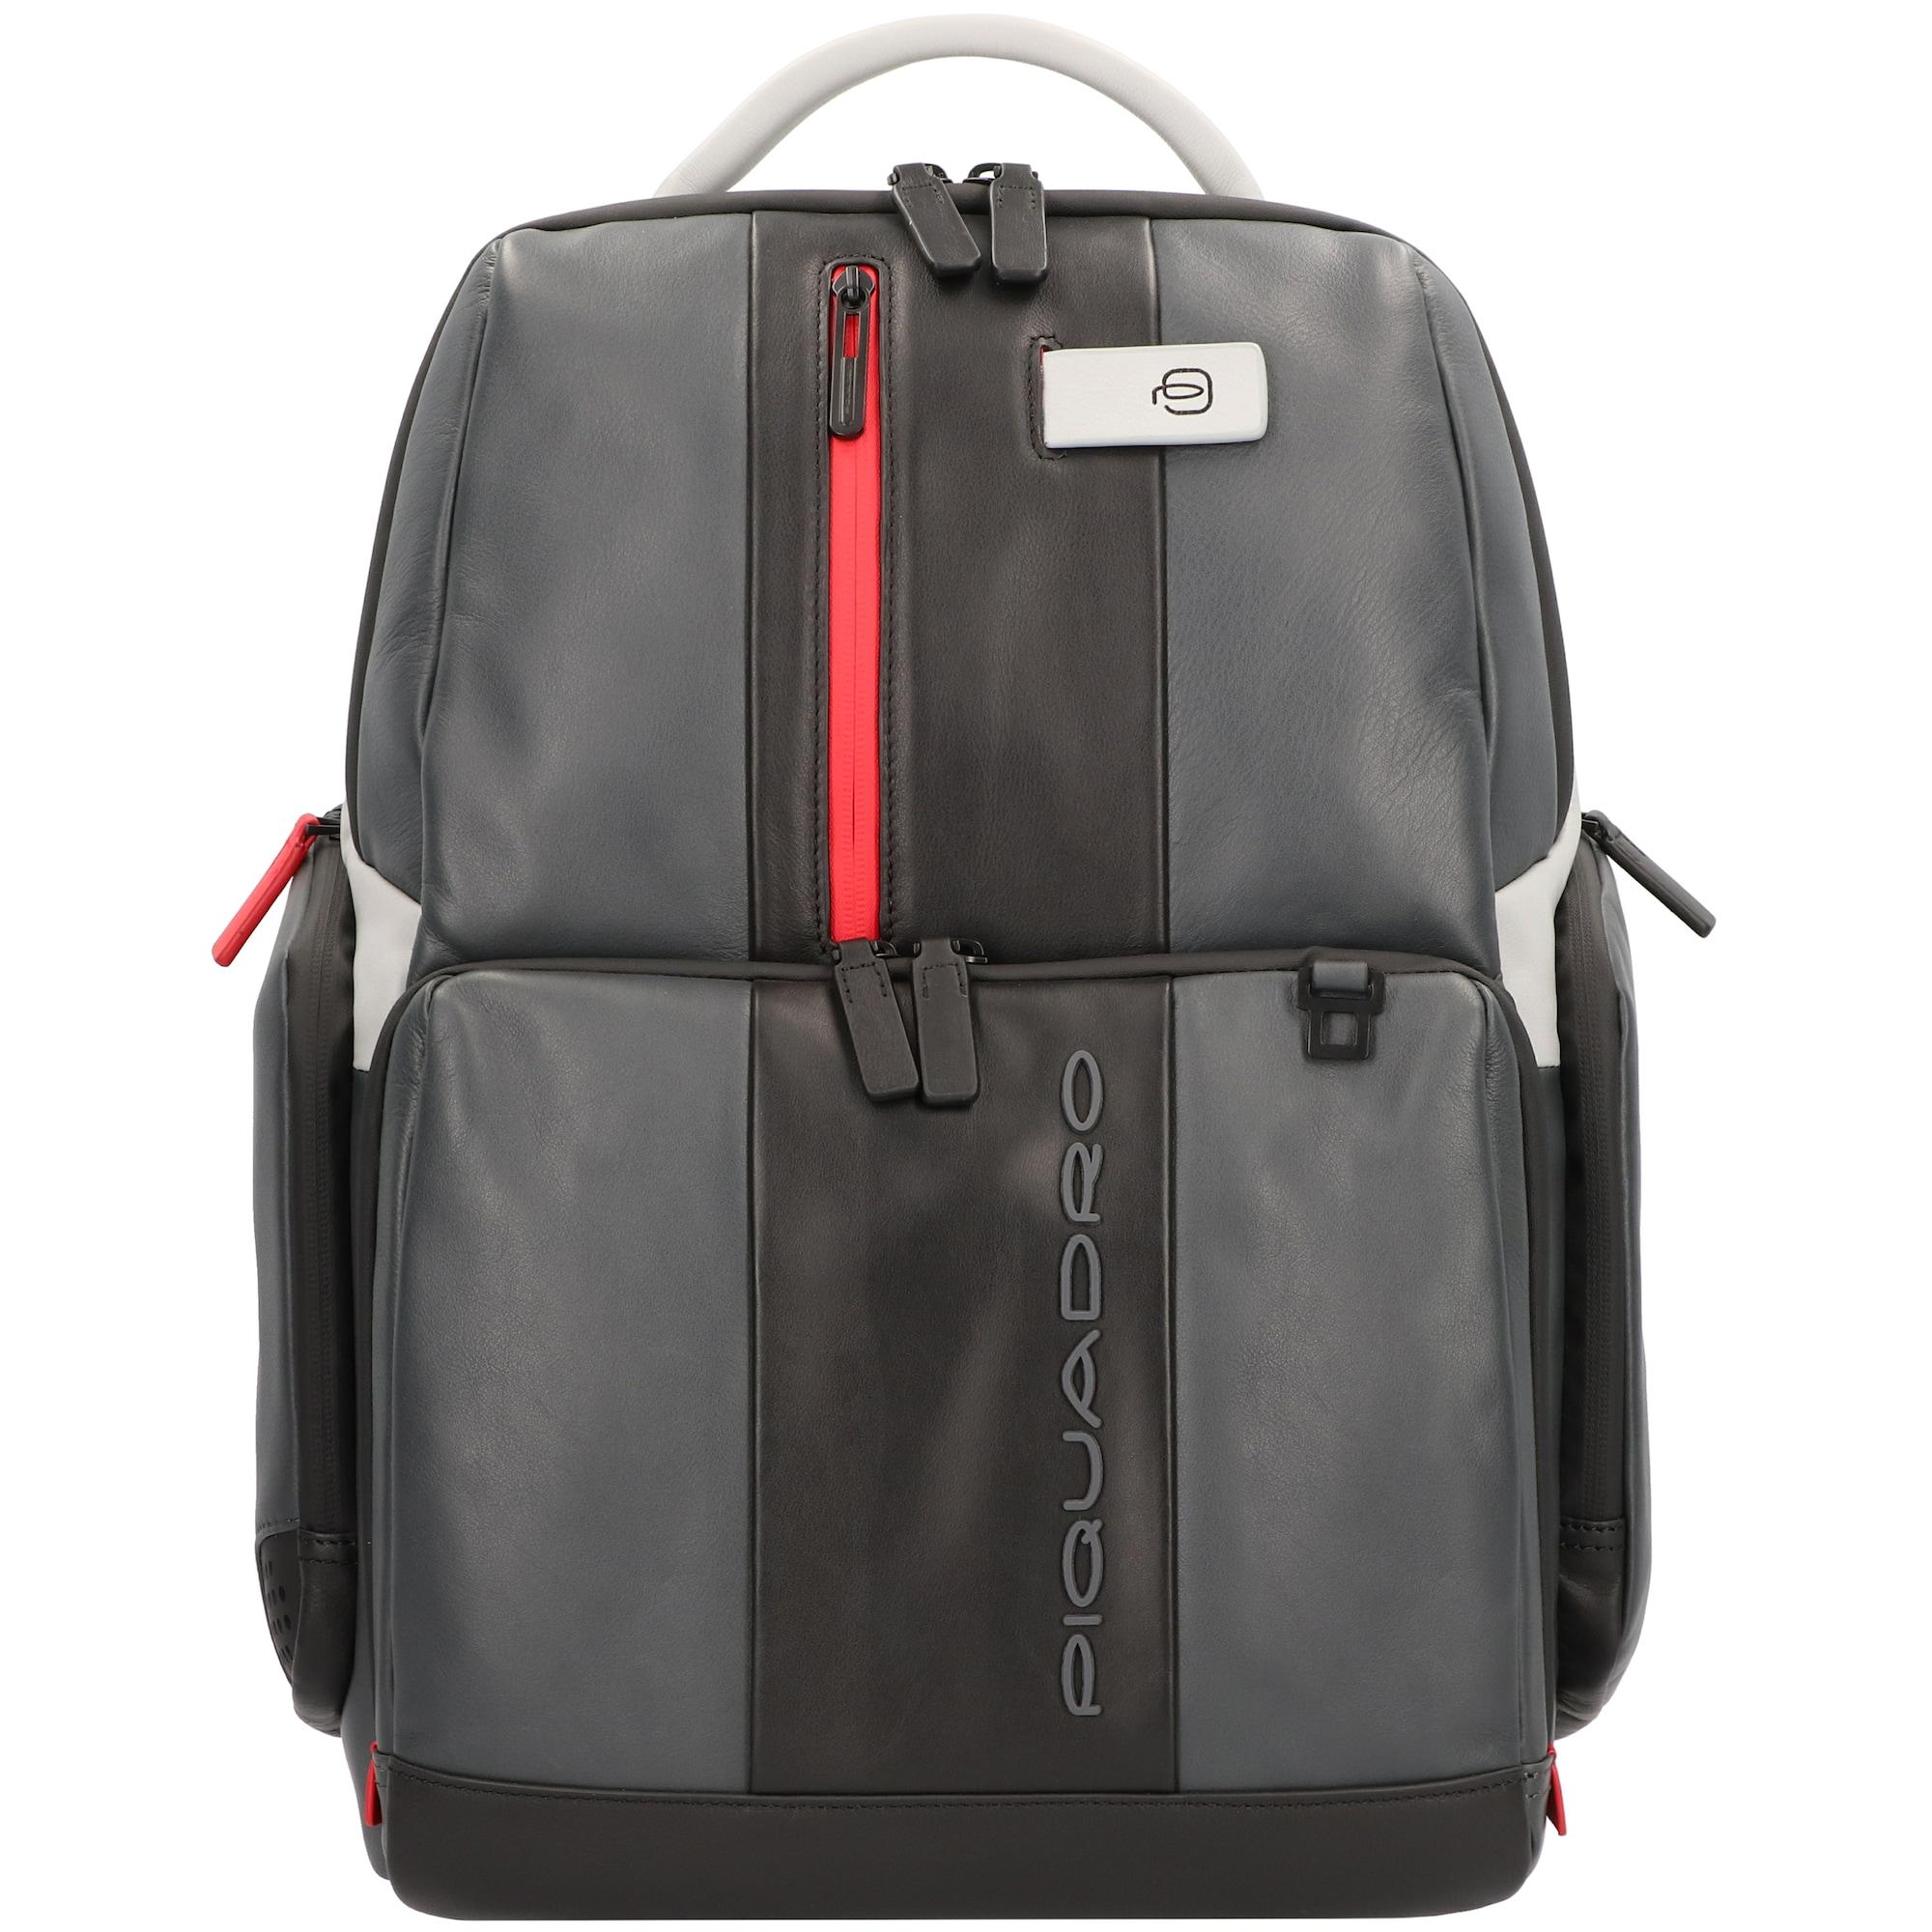 Businessrucksack 'Urban'   Taschen > Rucksäcke > Businessrucksäcke   Piquadro